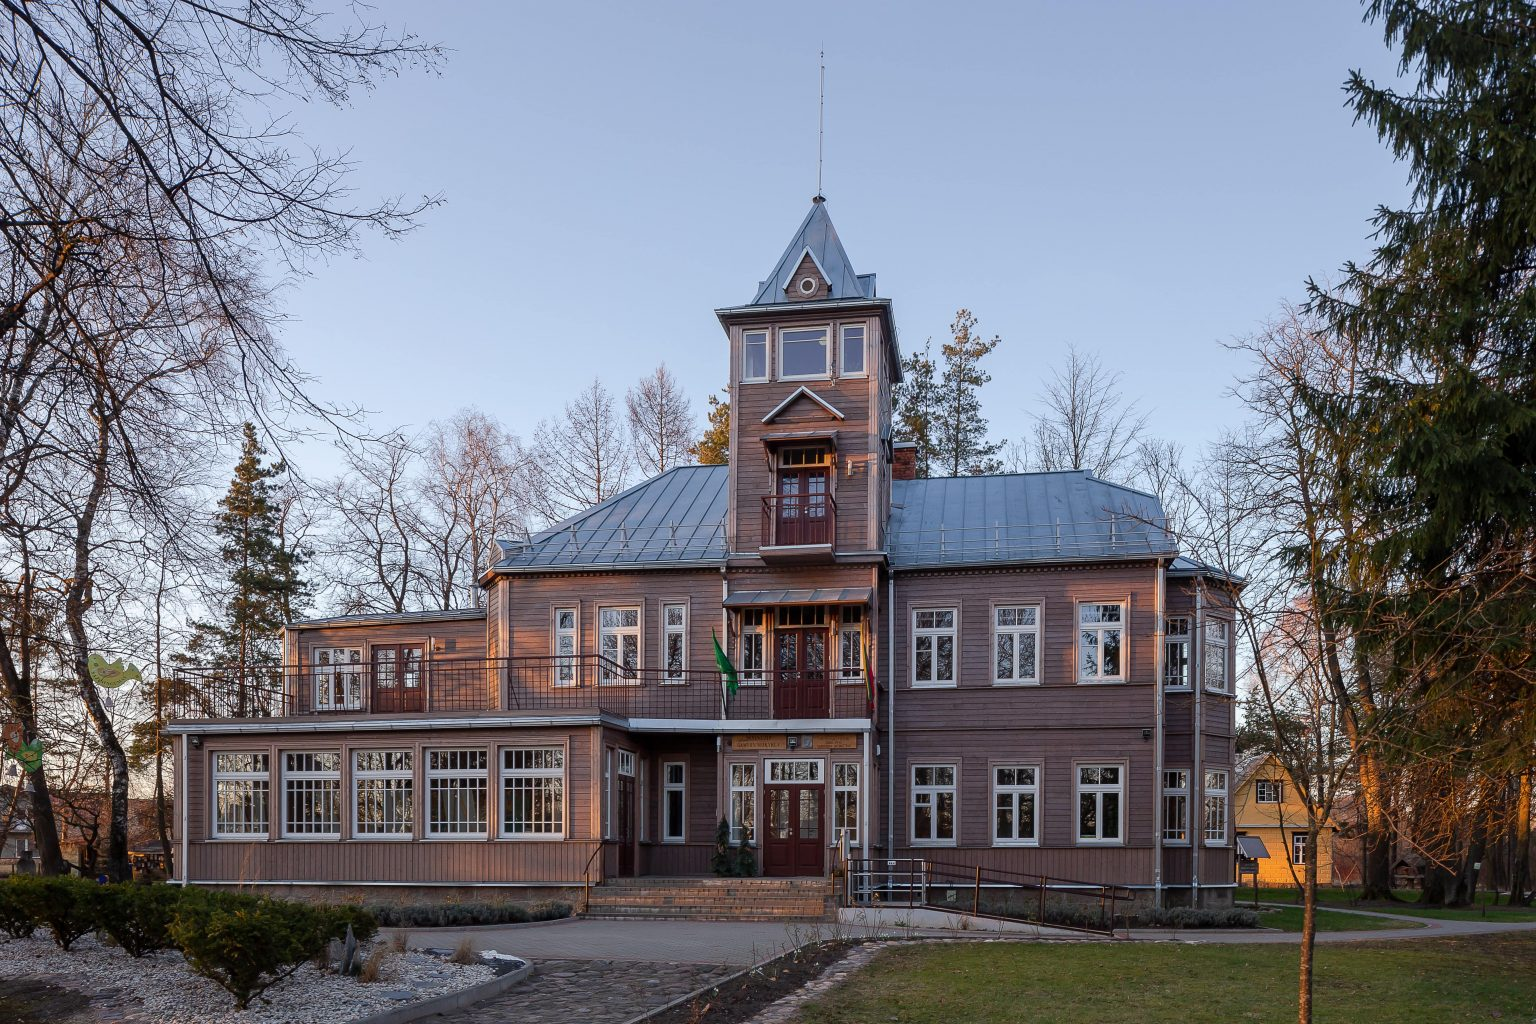 Česlovo Petraškevičiaus vila